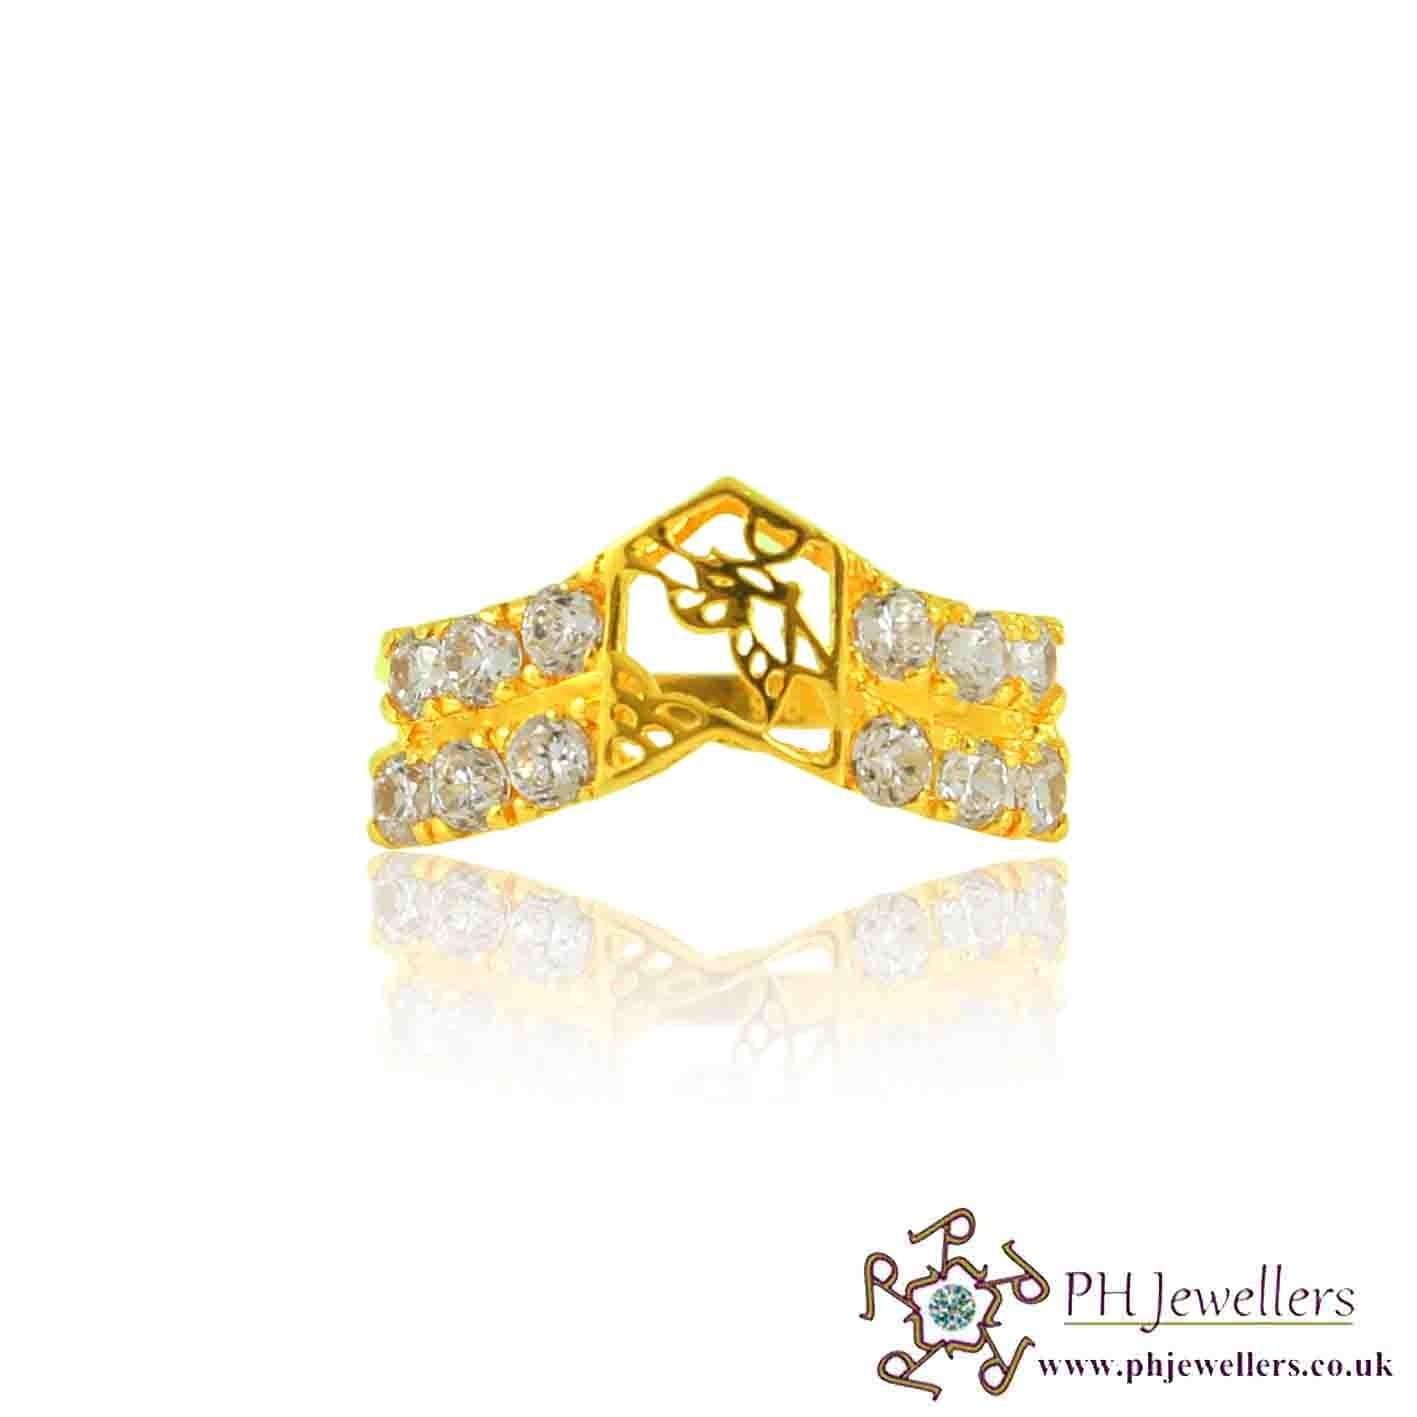 22ct 916 Yellow Gold Hallmark wishbone Ring CZ Size P  SR123